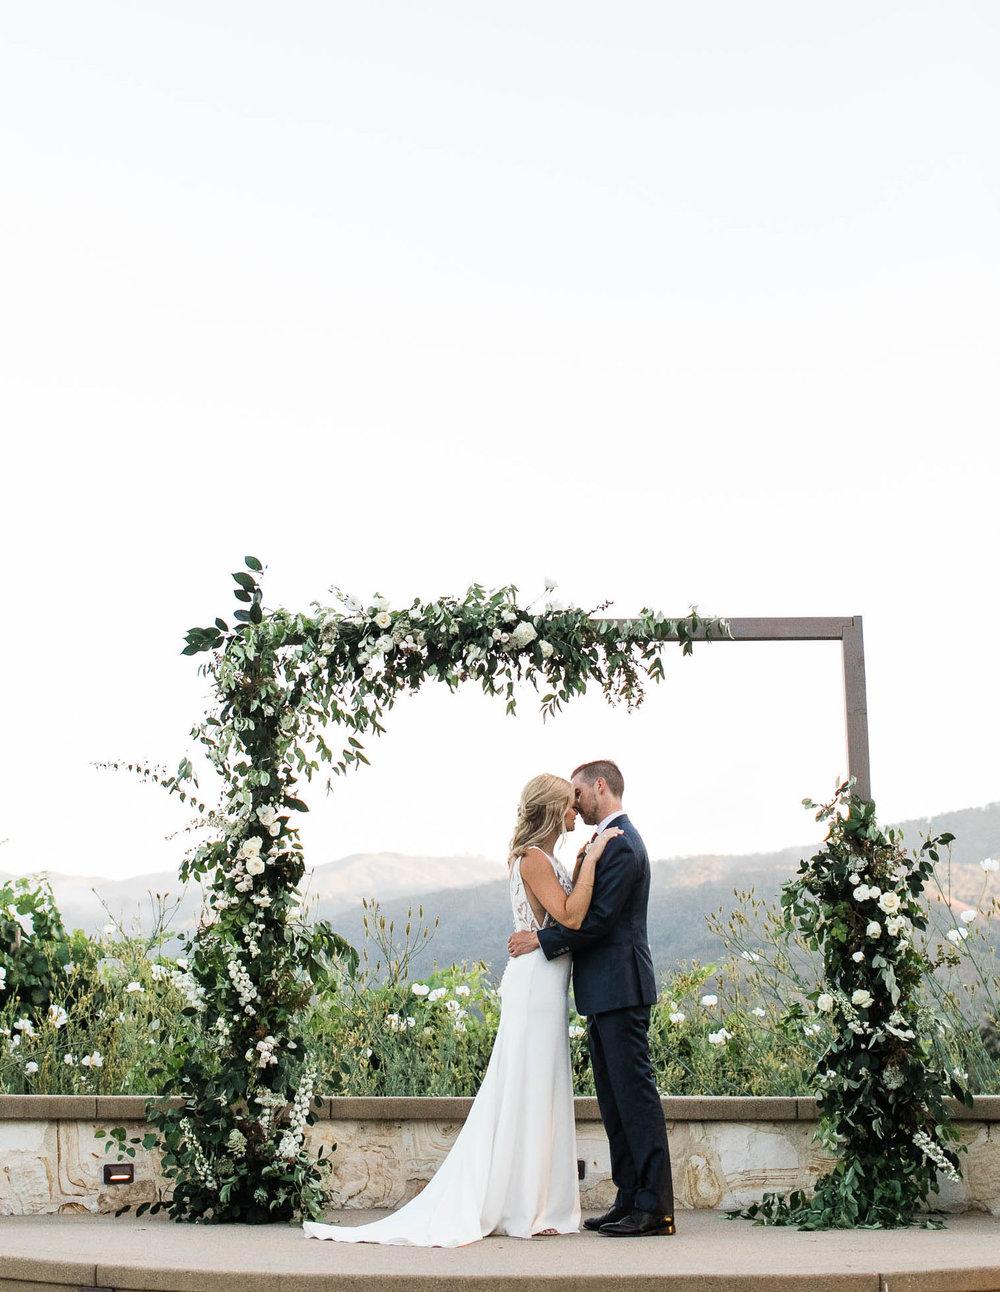 072118_D+K_Holman Ranch Wedding_Buena Lane Photography_1482ERcrop.jpg